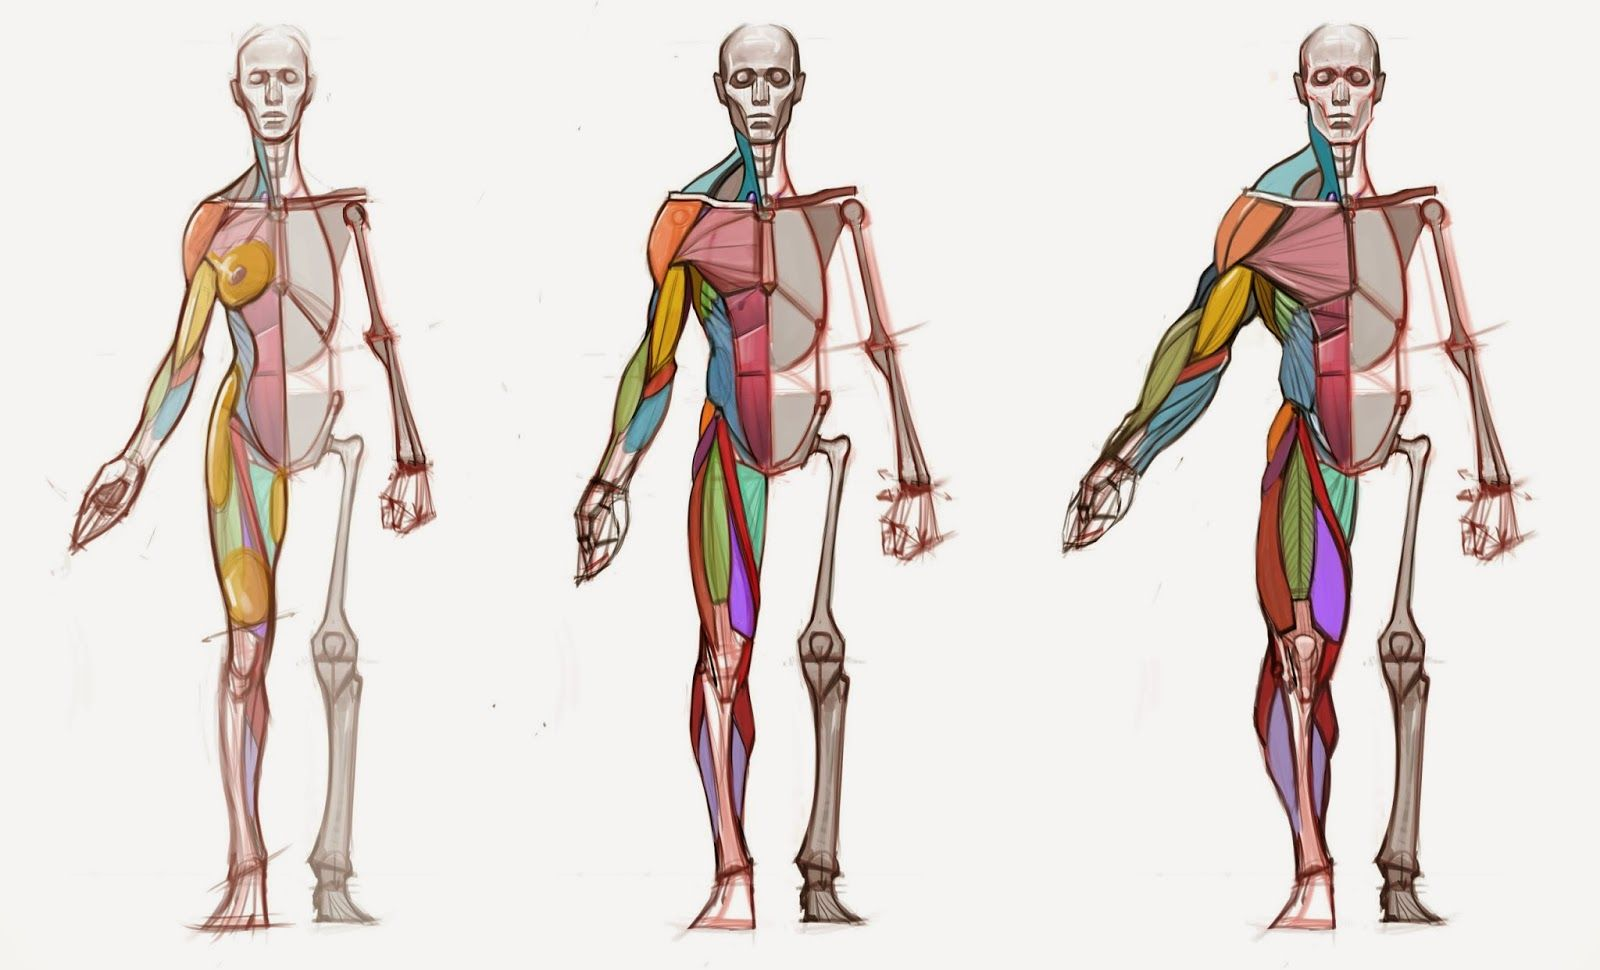 hampton anatomy - Buscar con Google | JD | Pinterest | Anatomy ...